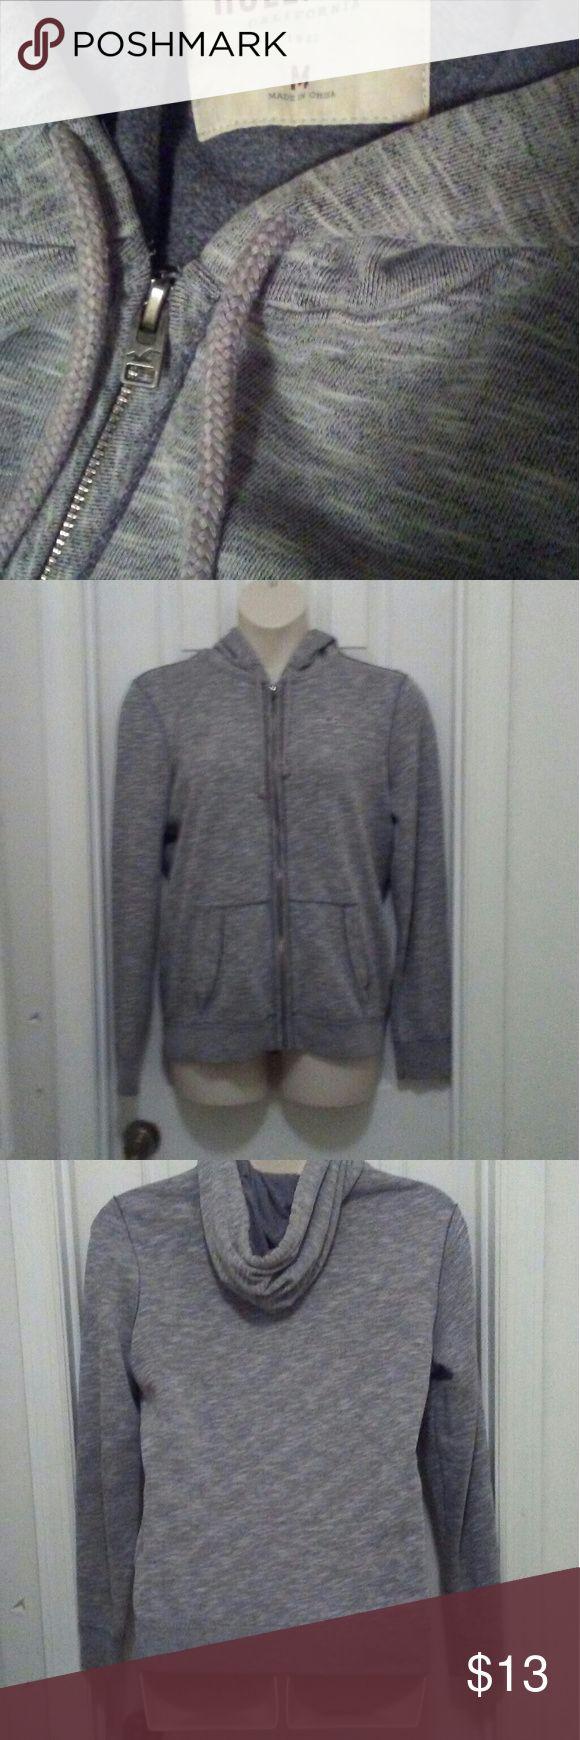 Hollister jacket Gray medium zip up jacket w/hoodie in excellebt condition Hollister Jackets & Coats